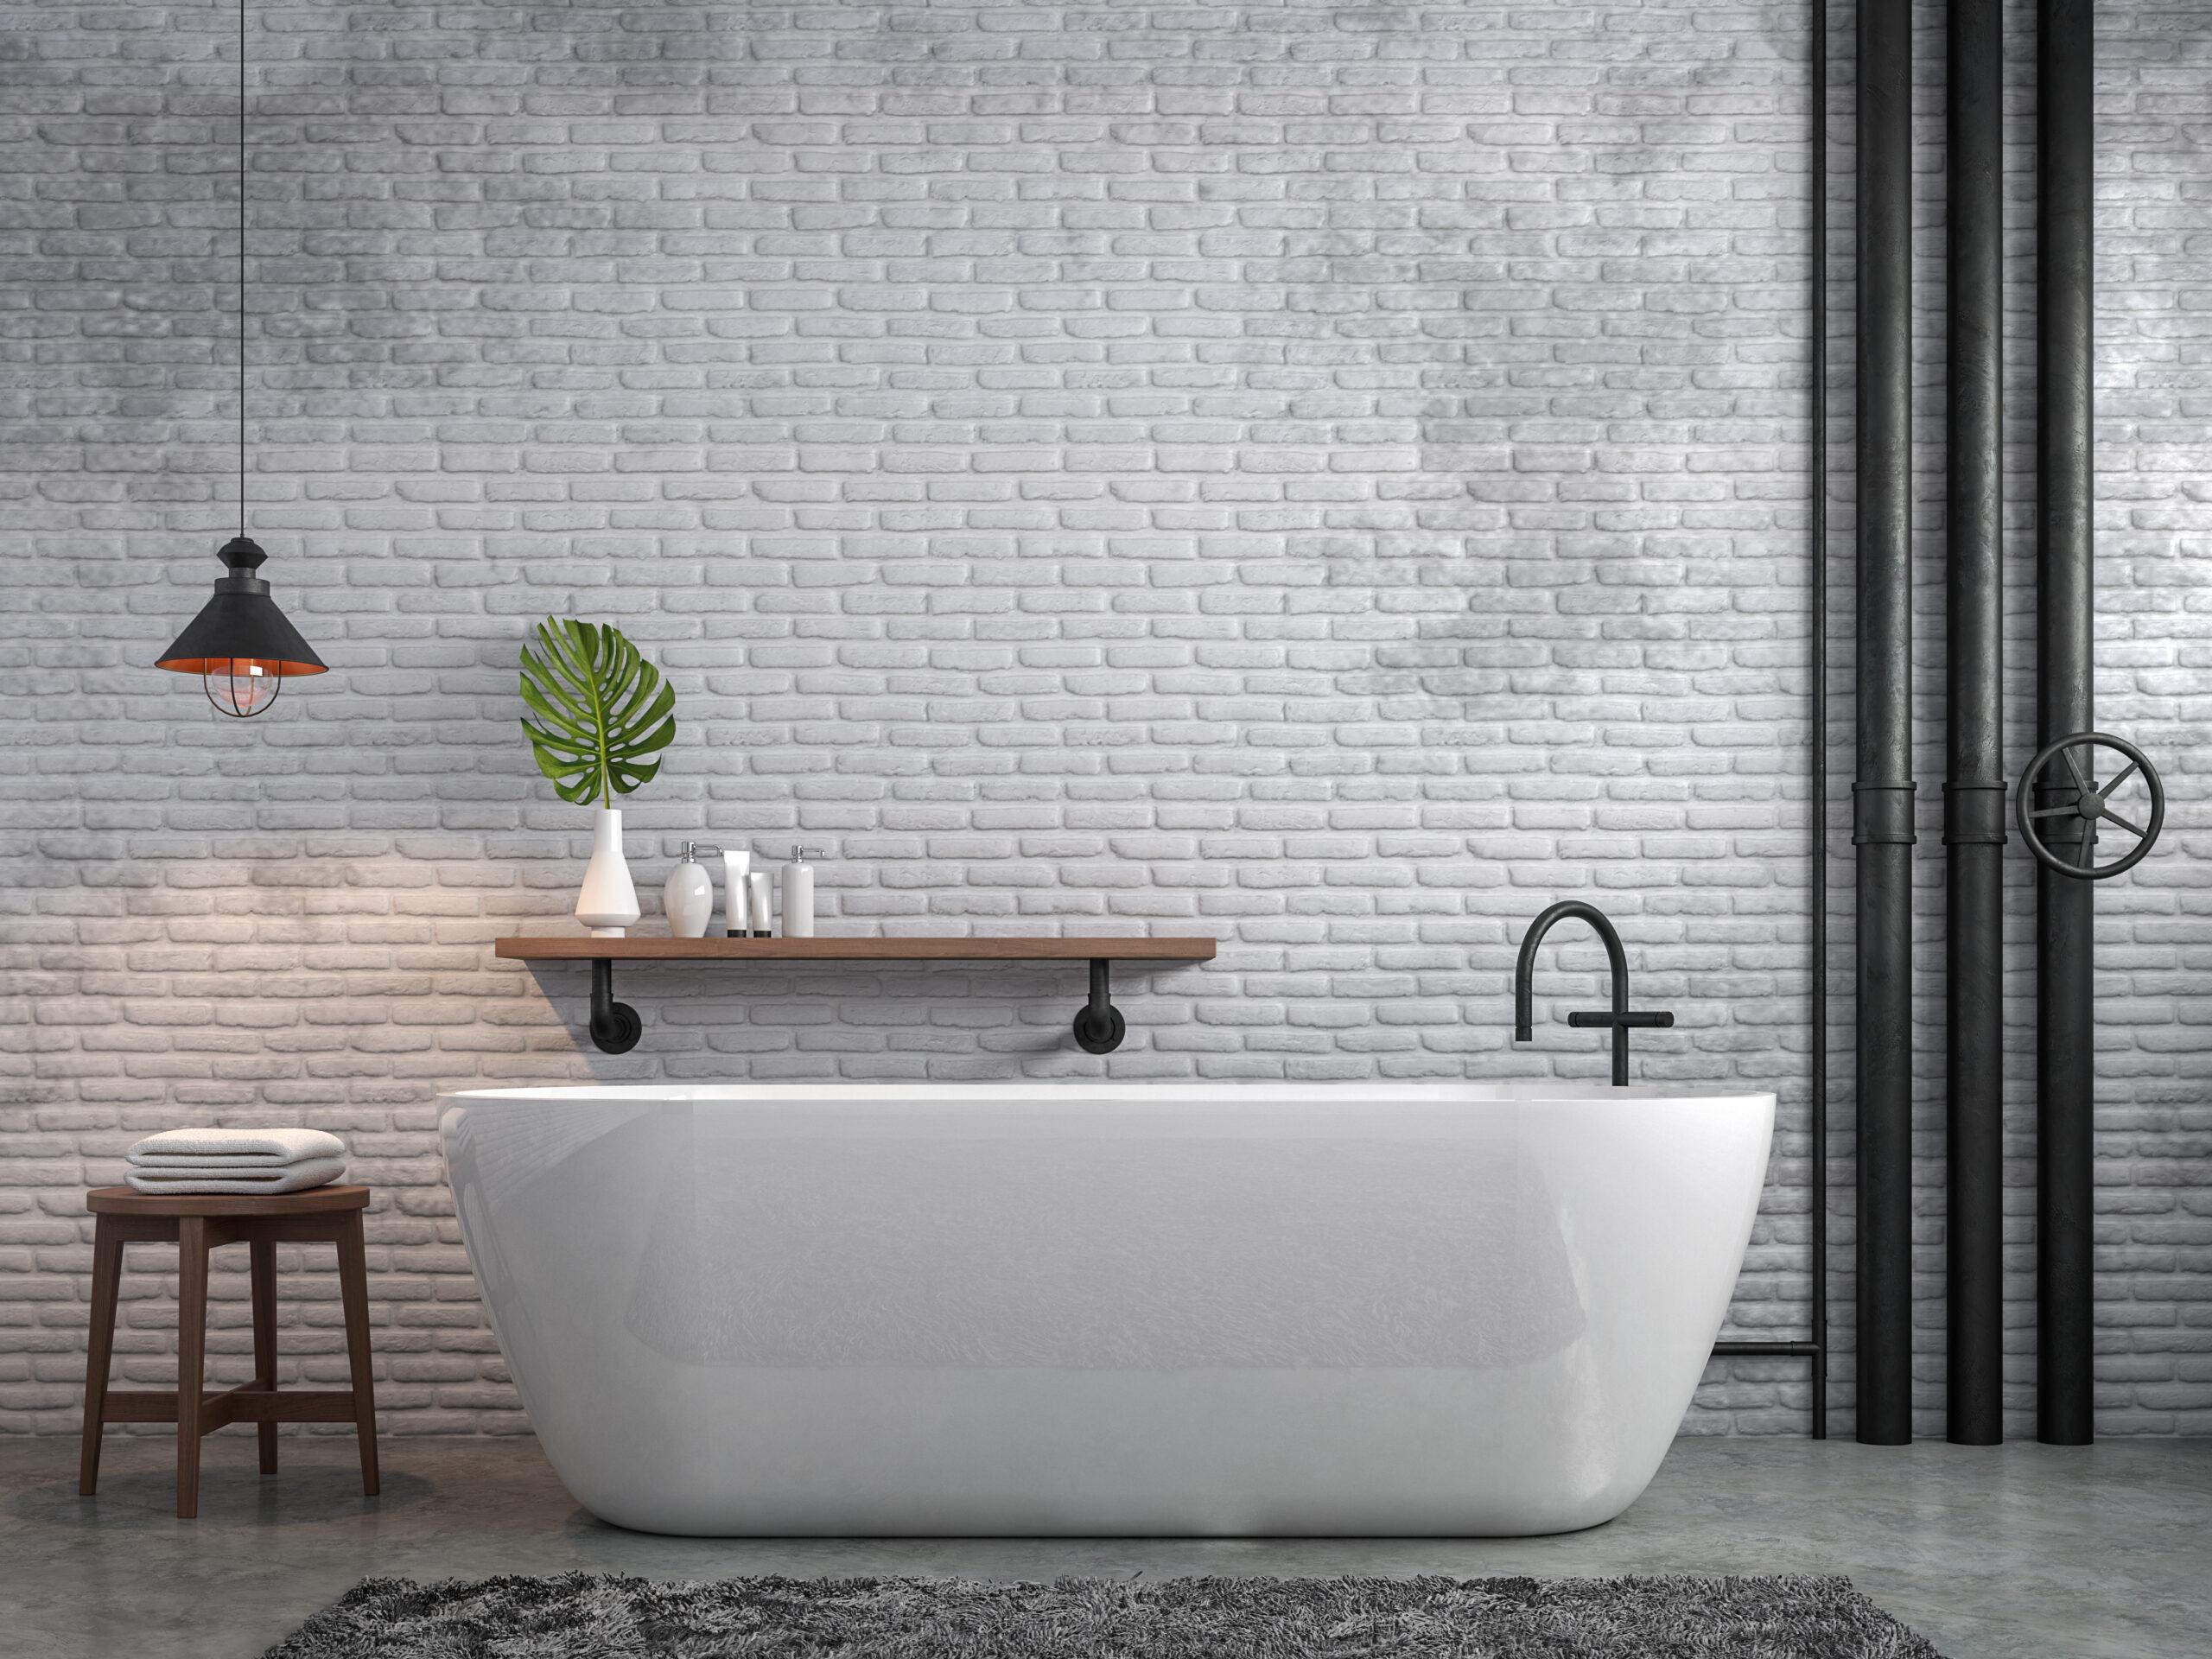 photo salle bain deco loft industrielphoto